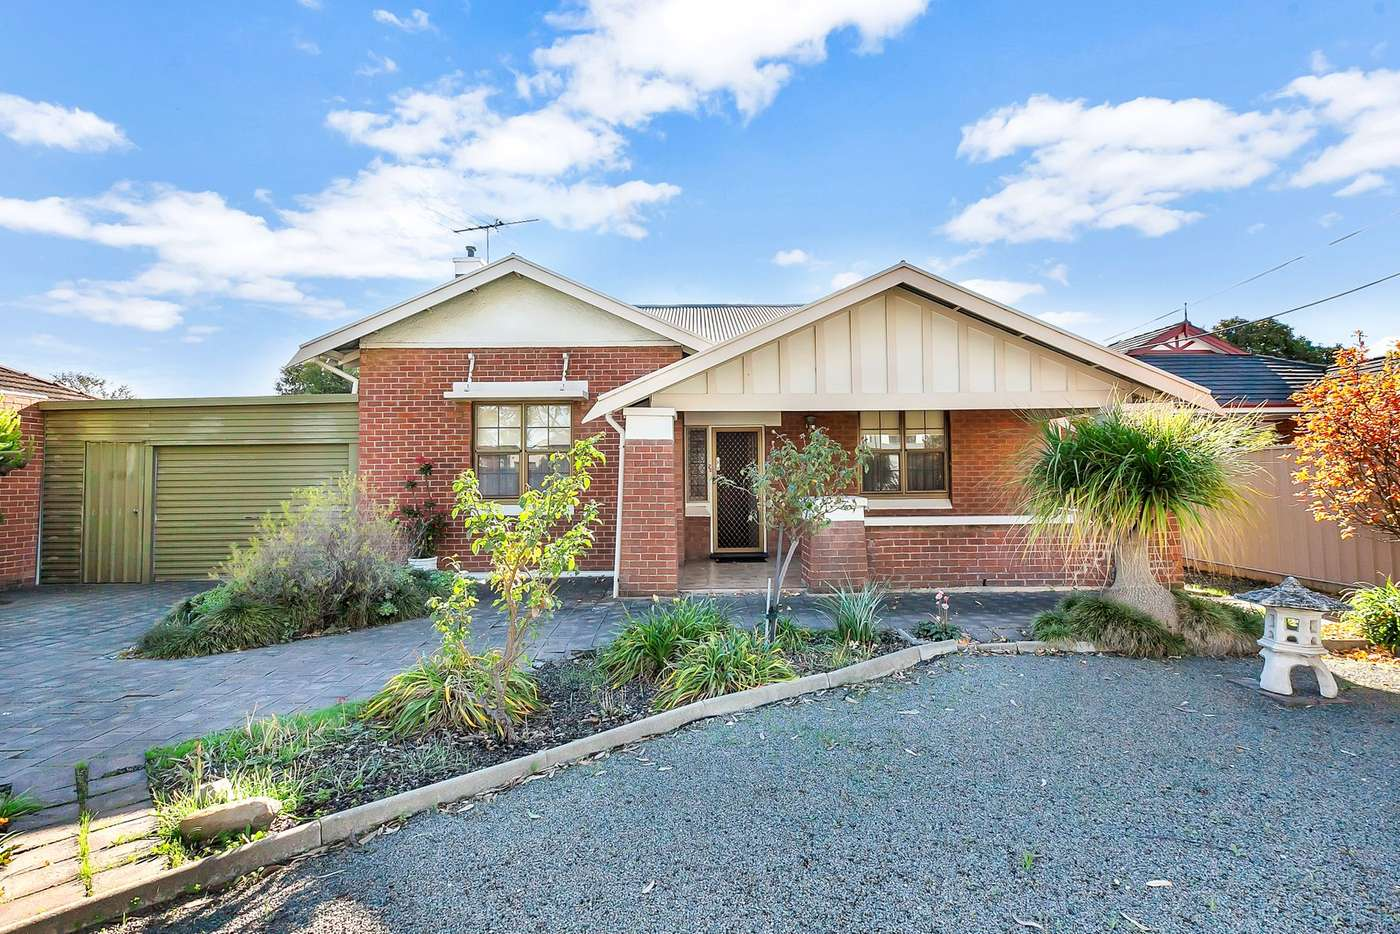 Main view of Homely house listing, 41 Barwell Avenue, Marleston SA 5033